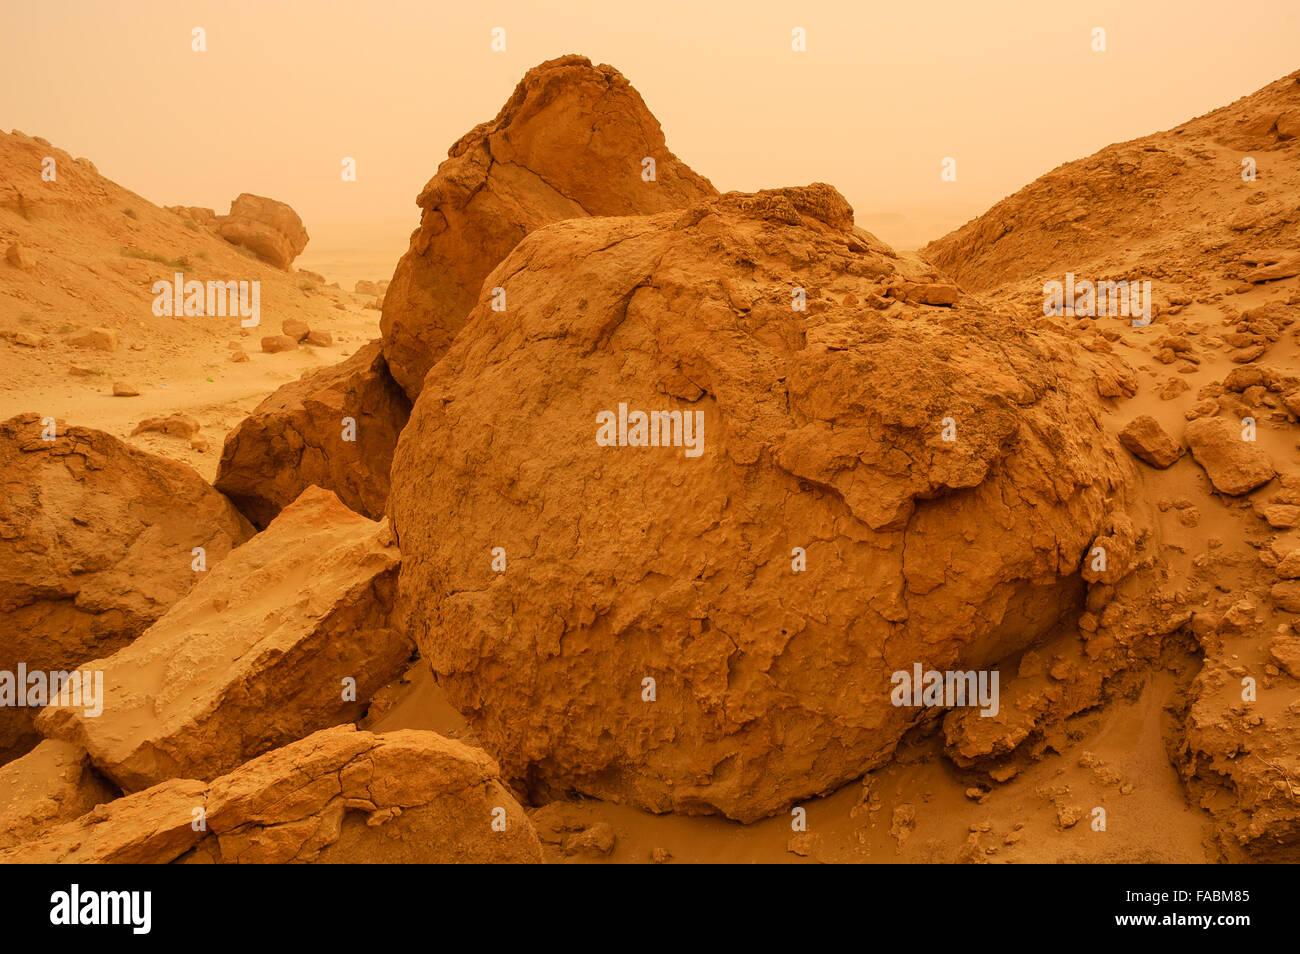 Boulders at Mutla, Kuwait - Stock Image